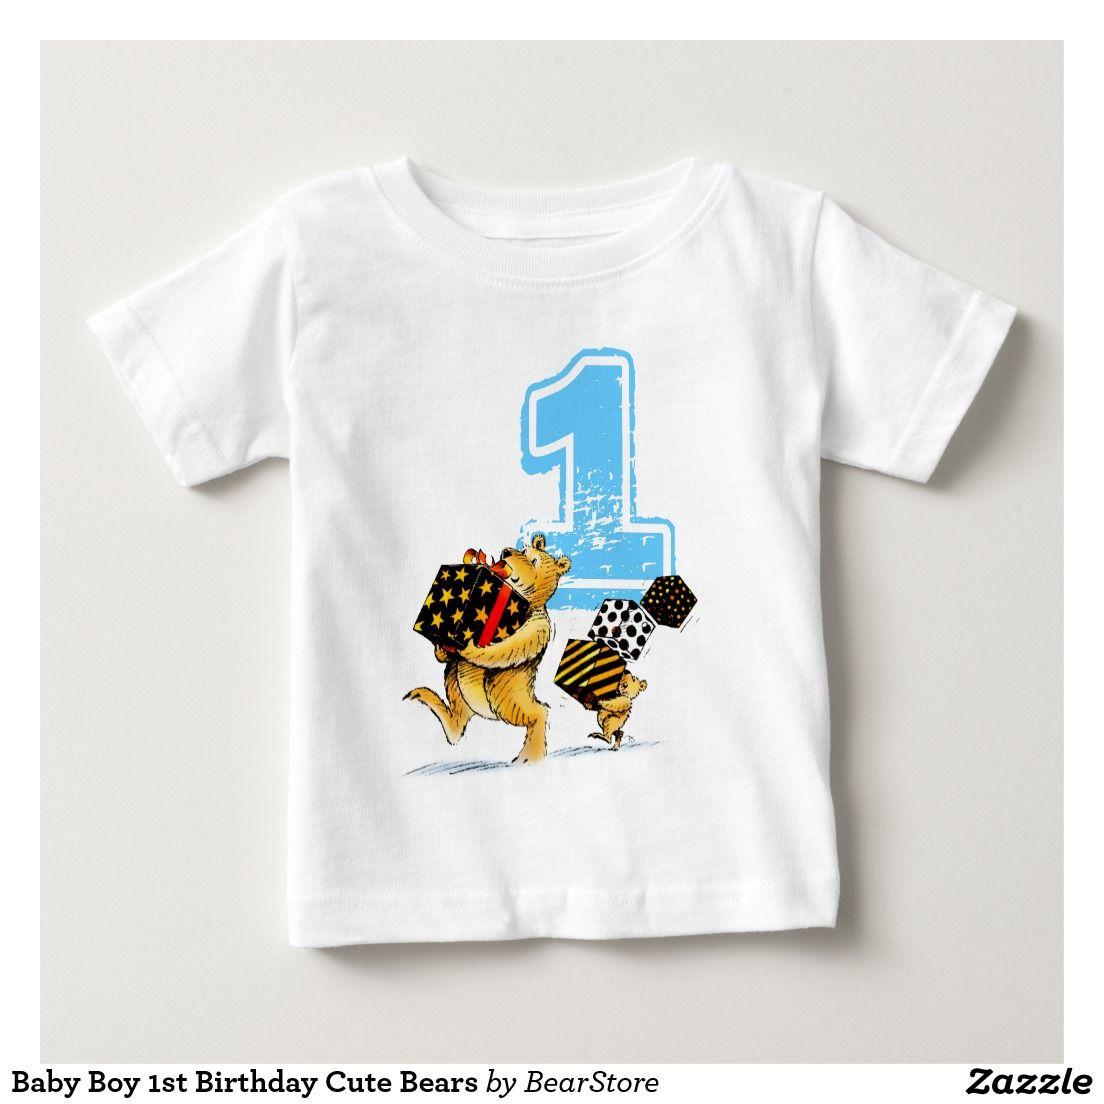 Baby Boy 1st Birthday Cute Bears T Shirt from BearStore